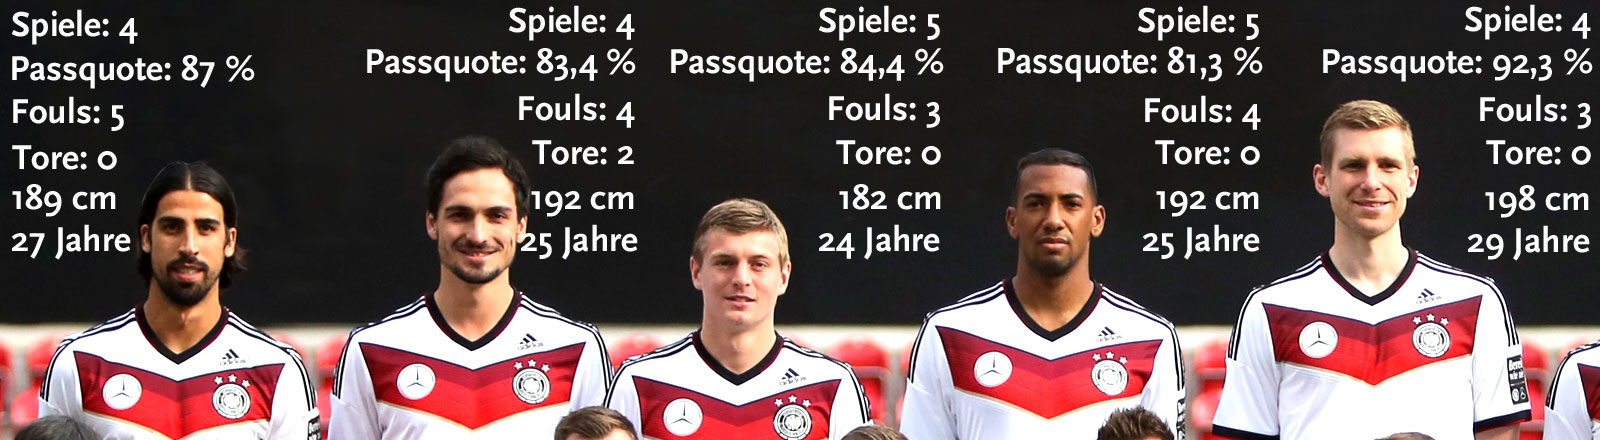 Die Nationalspieler Khedira, Hummels, Kroos, Boateng, Mertesacker